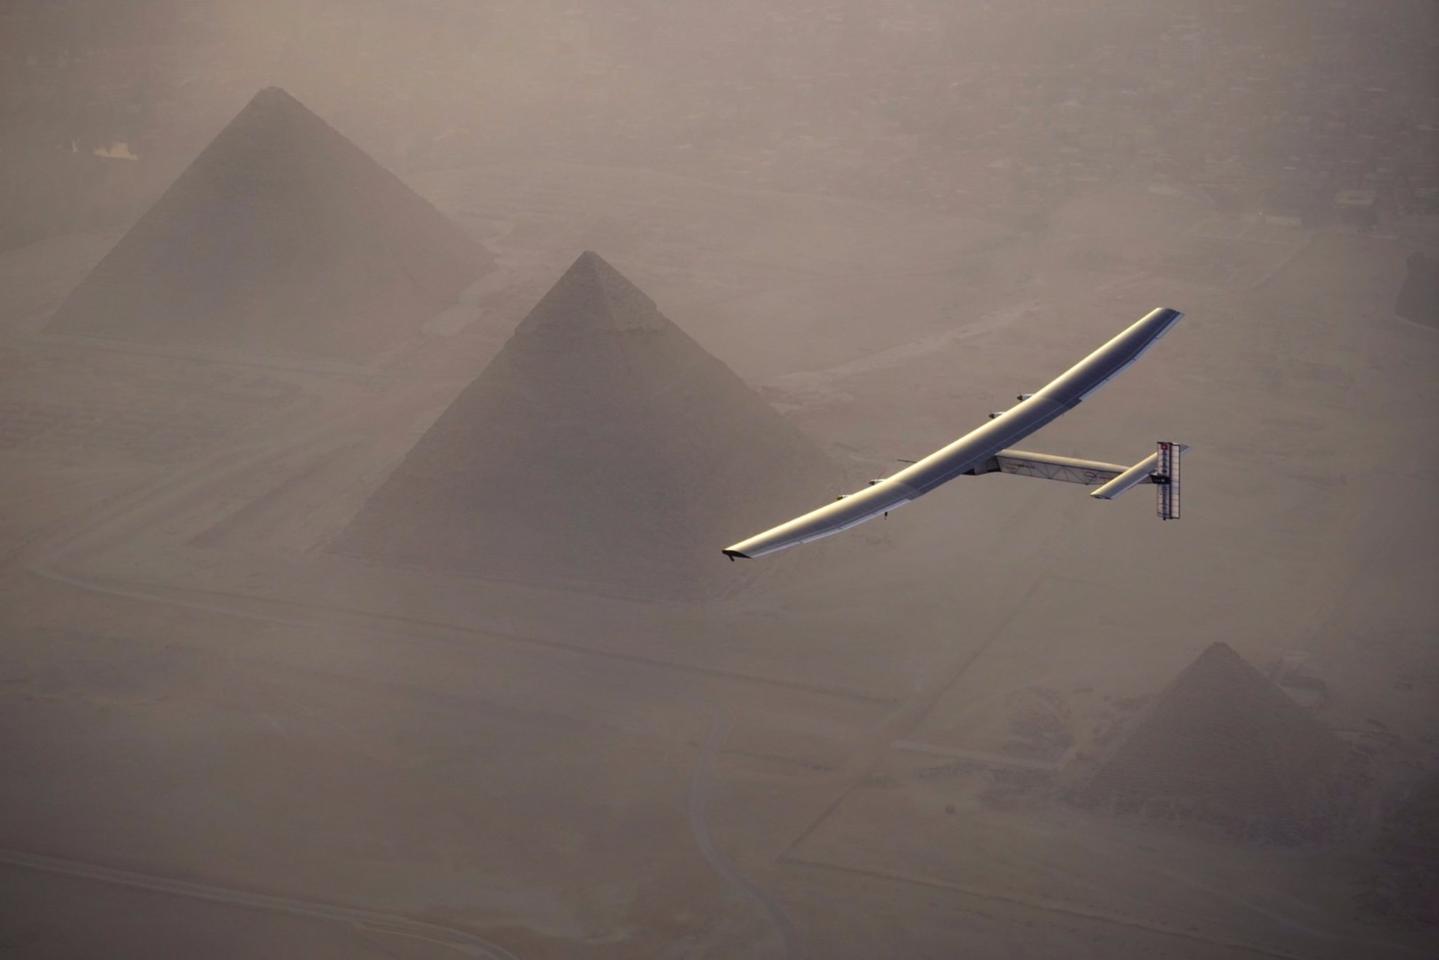 Solar Impulse 2 over the Great Pyramid